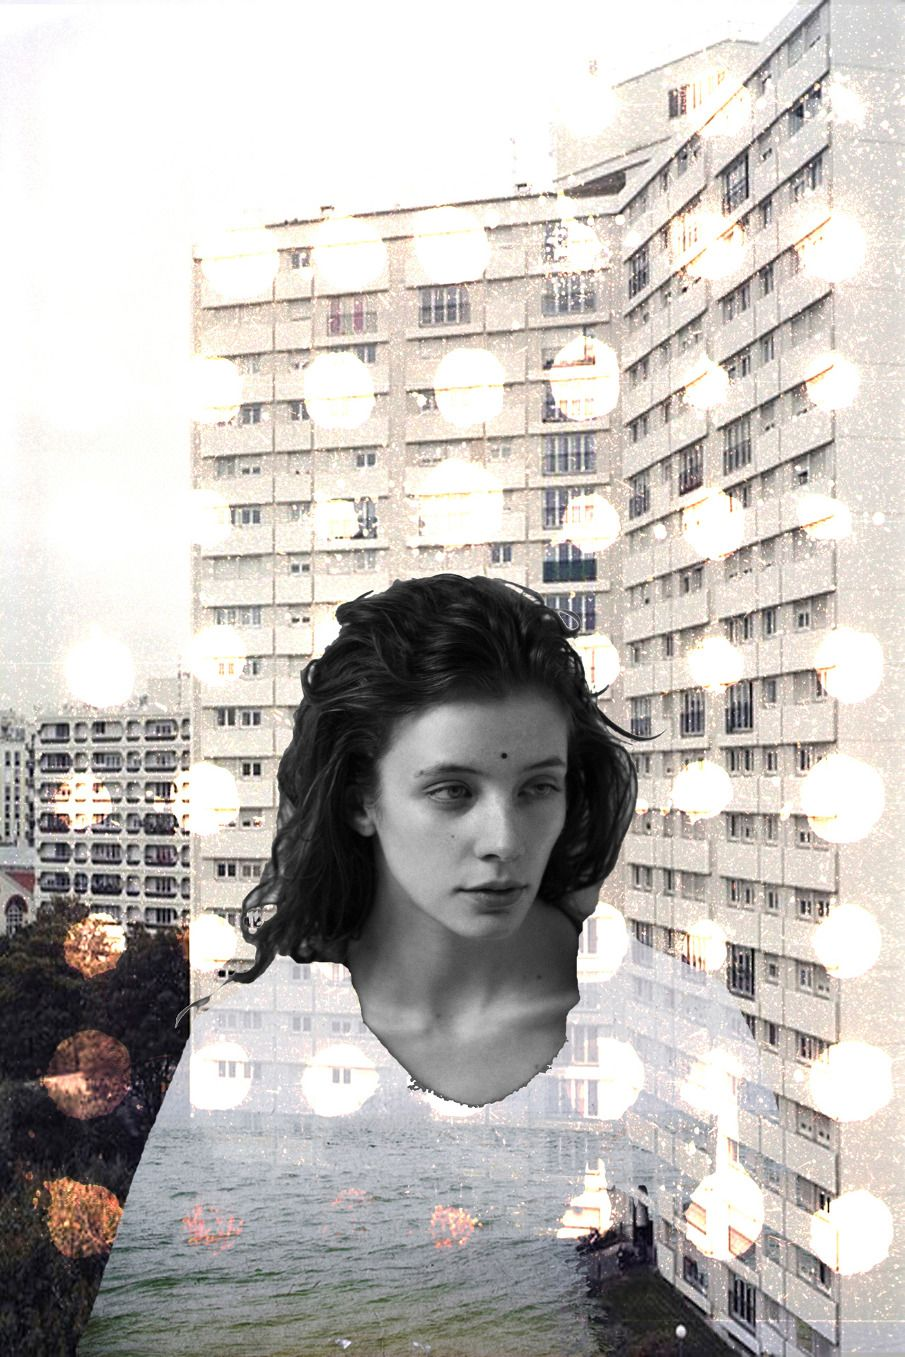 Mona collage for Rêver Magazine - bundenko photography